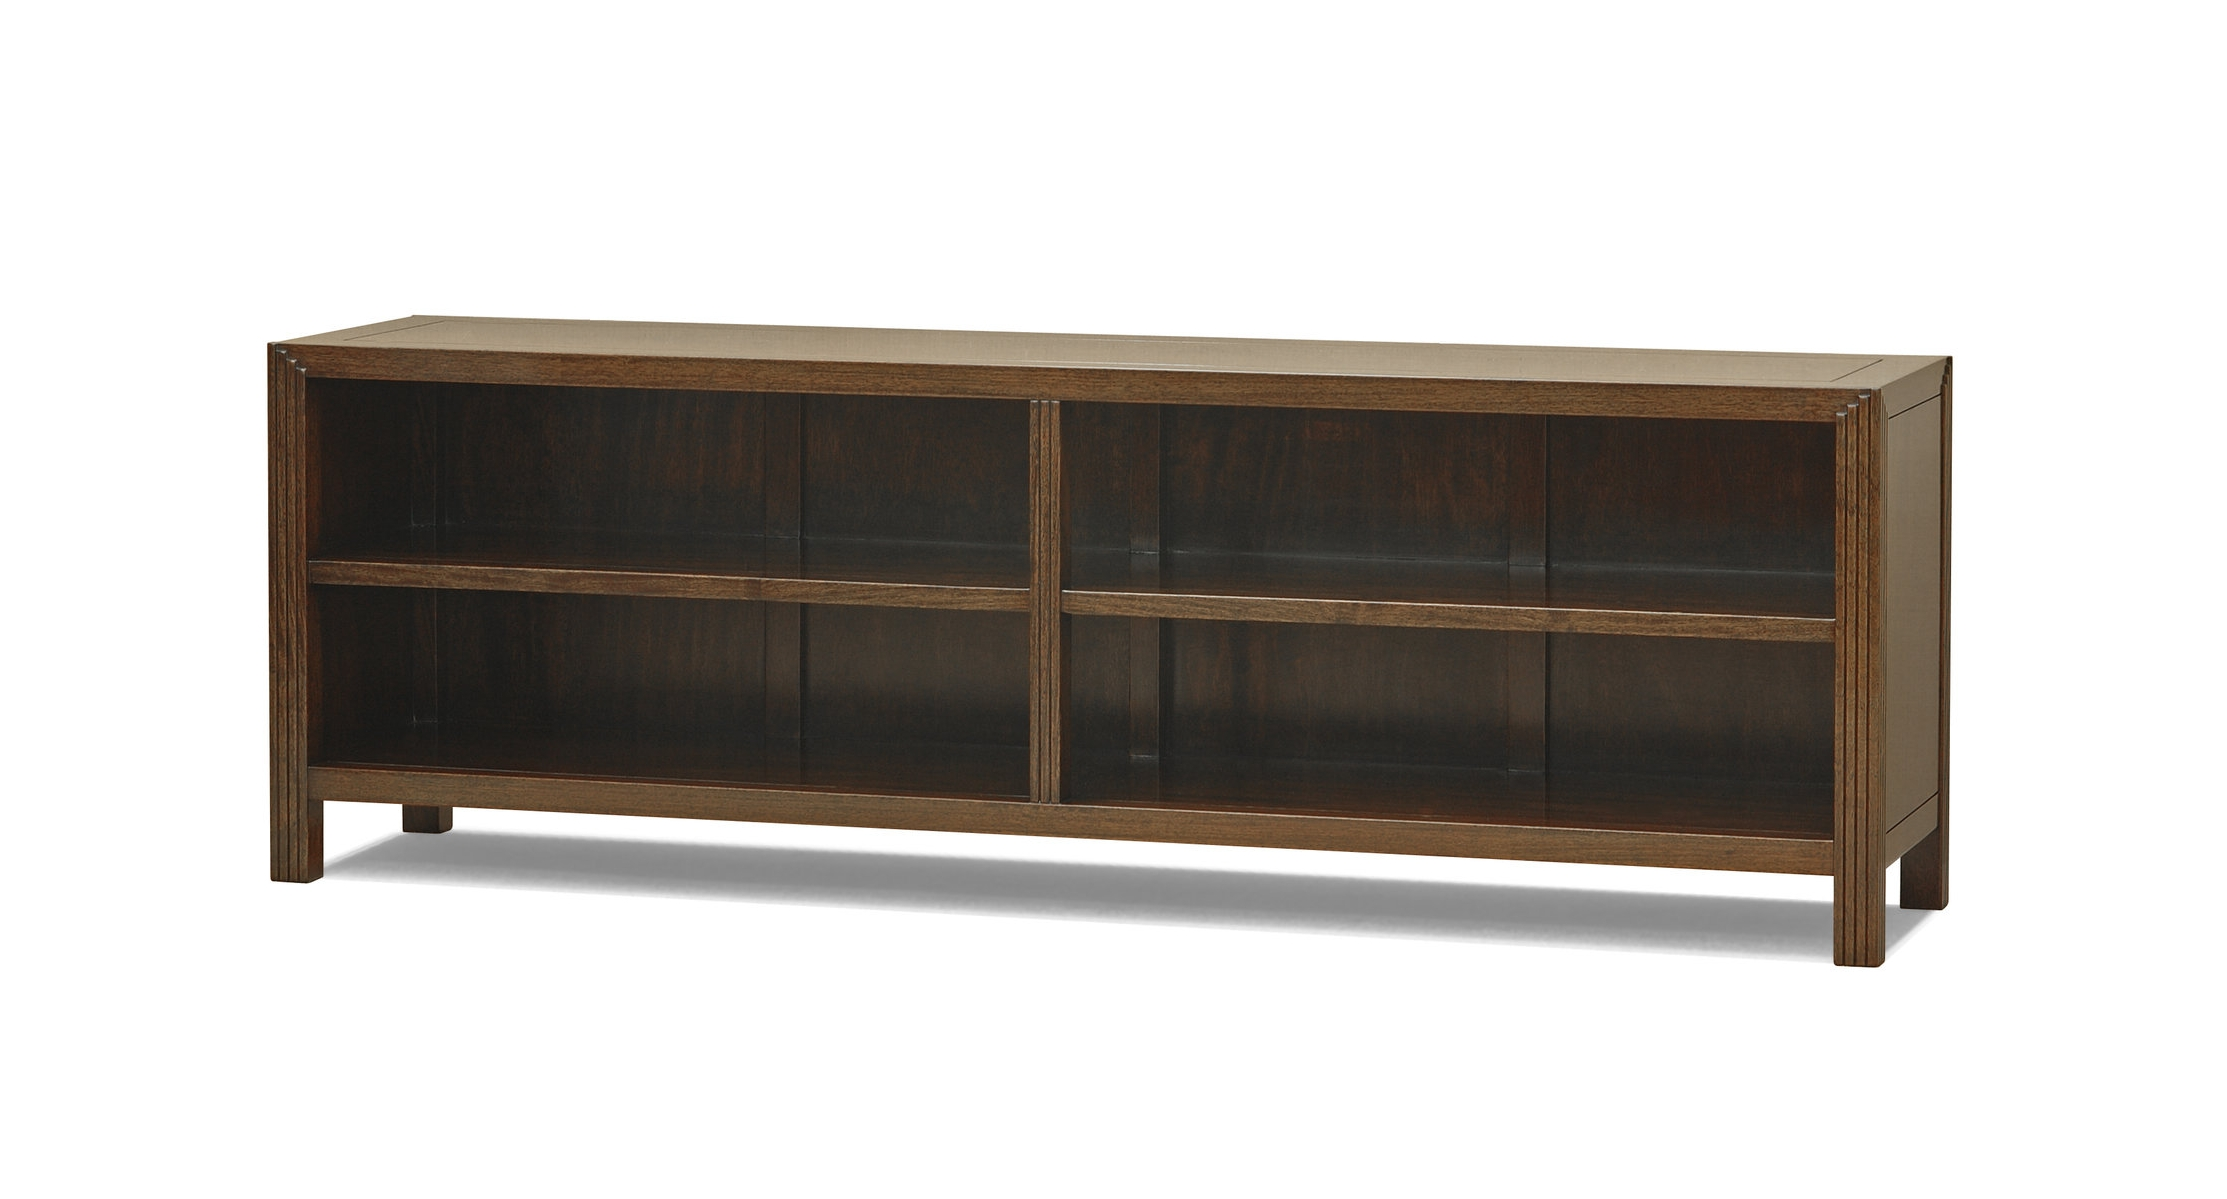 ....Bespoke Art Deco furniture : Shoe shelf..特别定制艺术装饰风格家具: 鞋架....